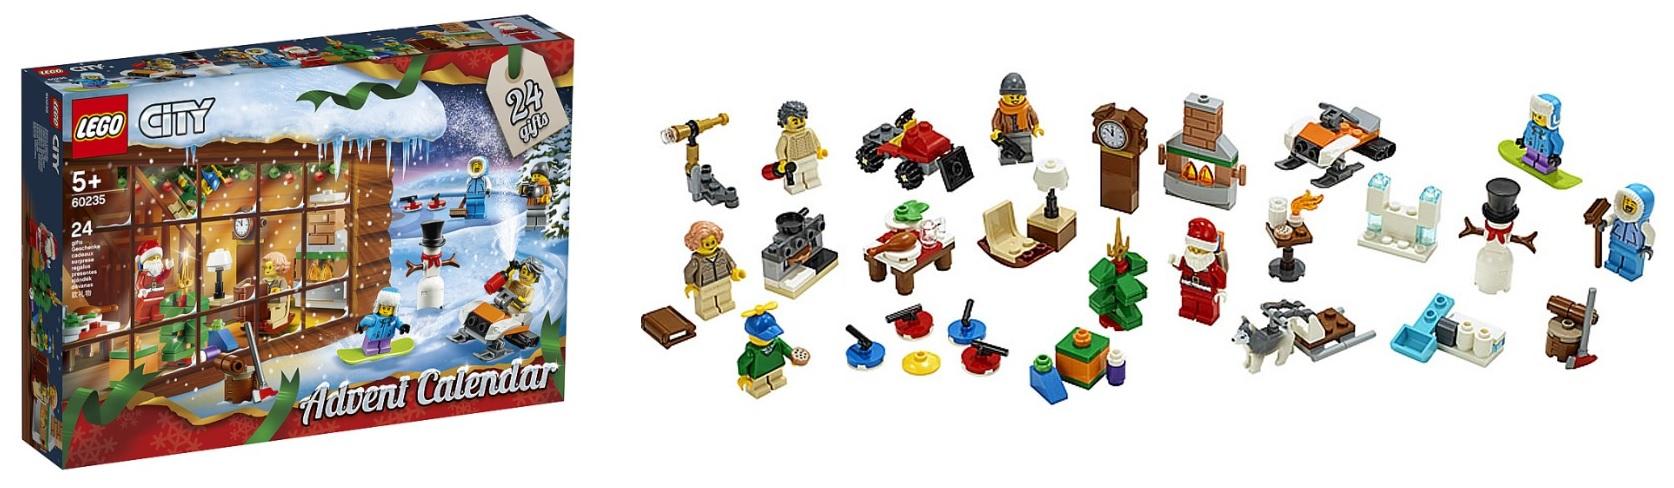 2019 lego advent calendars 7594 75245 41382 60235 toys n. Black Bedroom Furniture Sets. Home Design Ideas